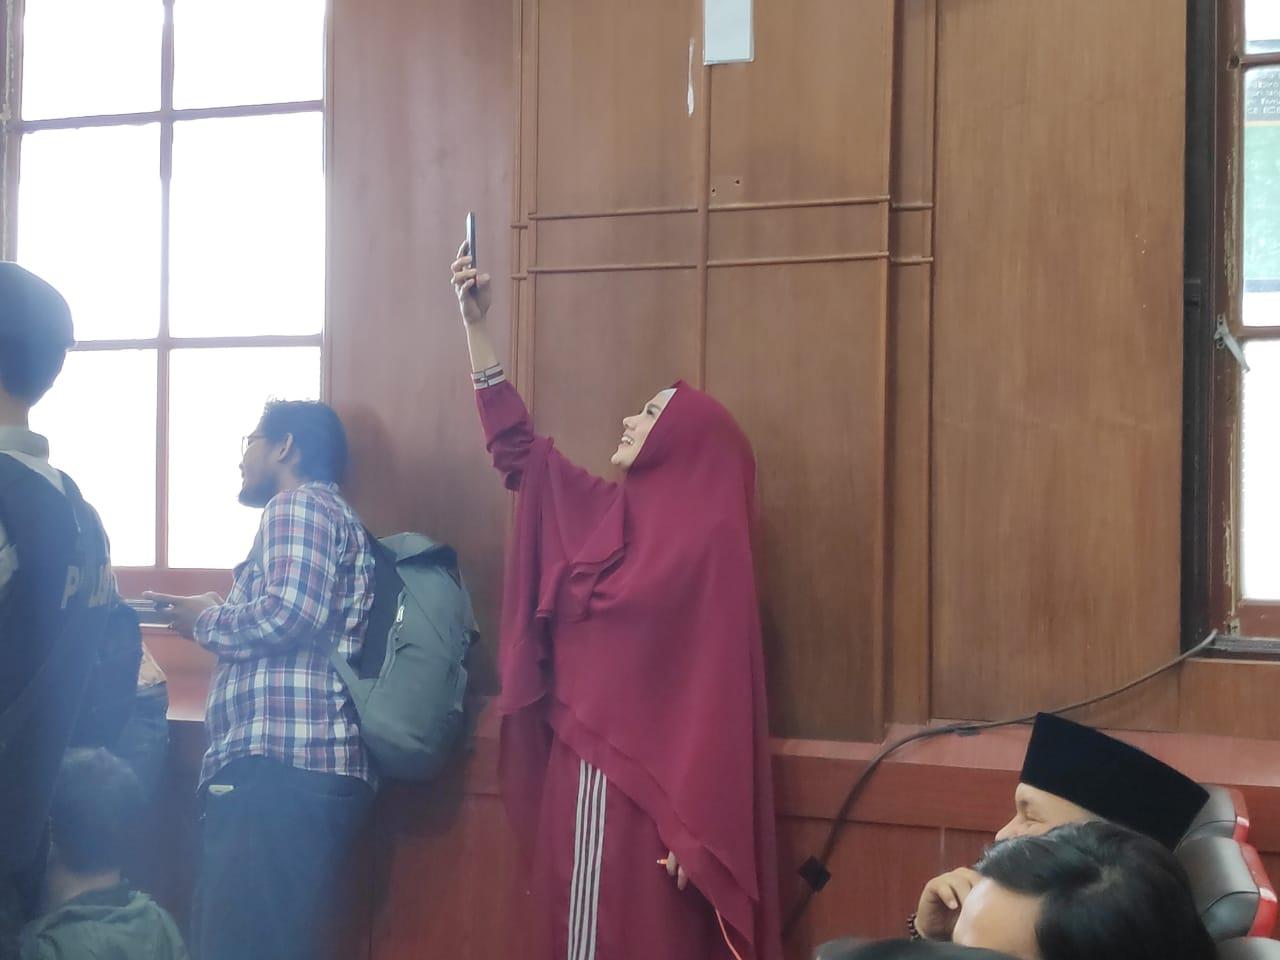 Mulan Jameela Sibuk Rekam Suaminya di Persidangan